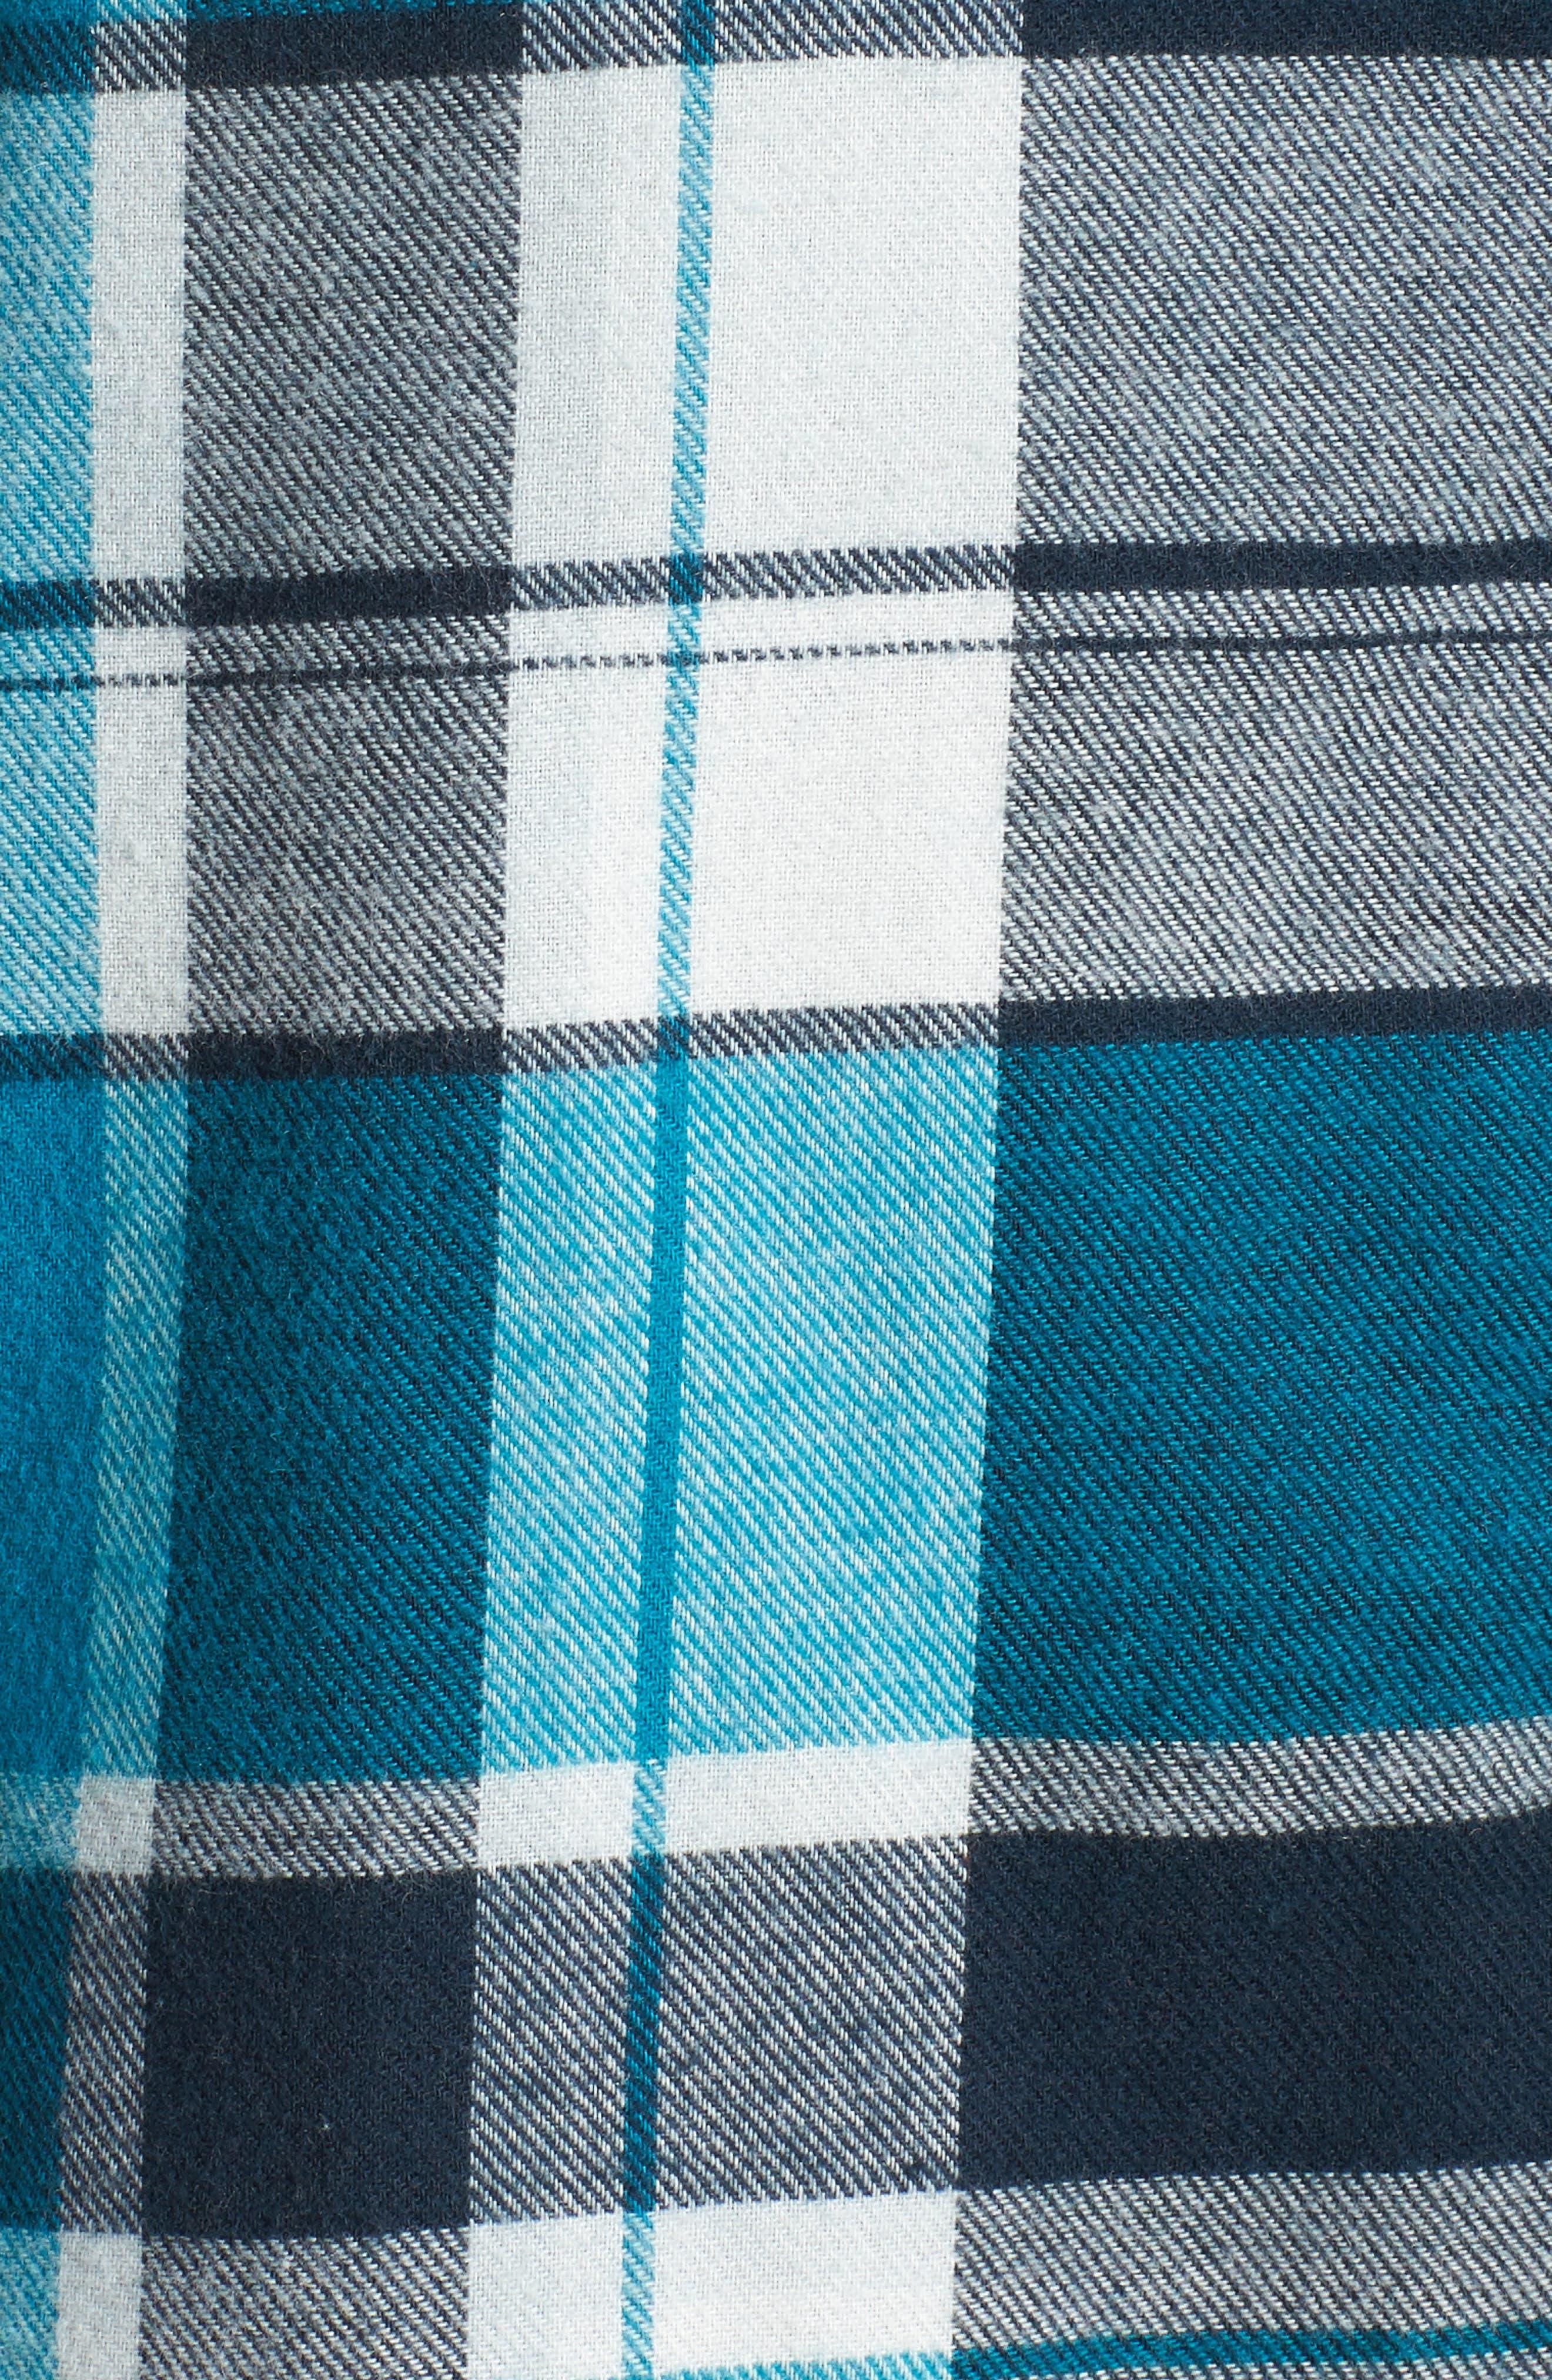 Flannel Nightshirt,                             Alternate thumbnail 6, color,                             Teal Enamel Multi Plaid